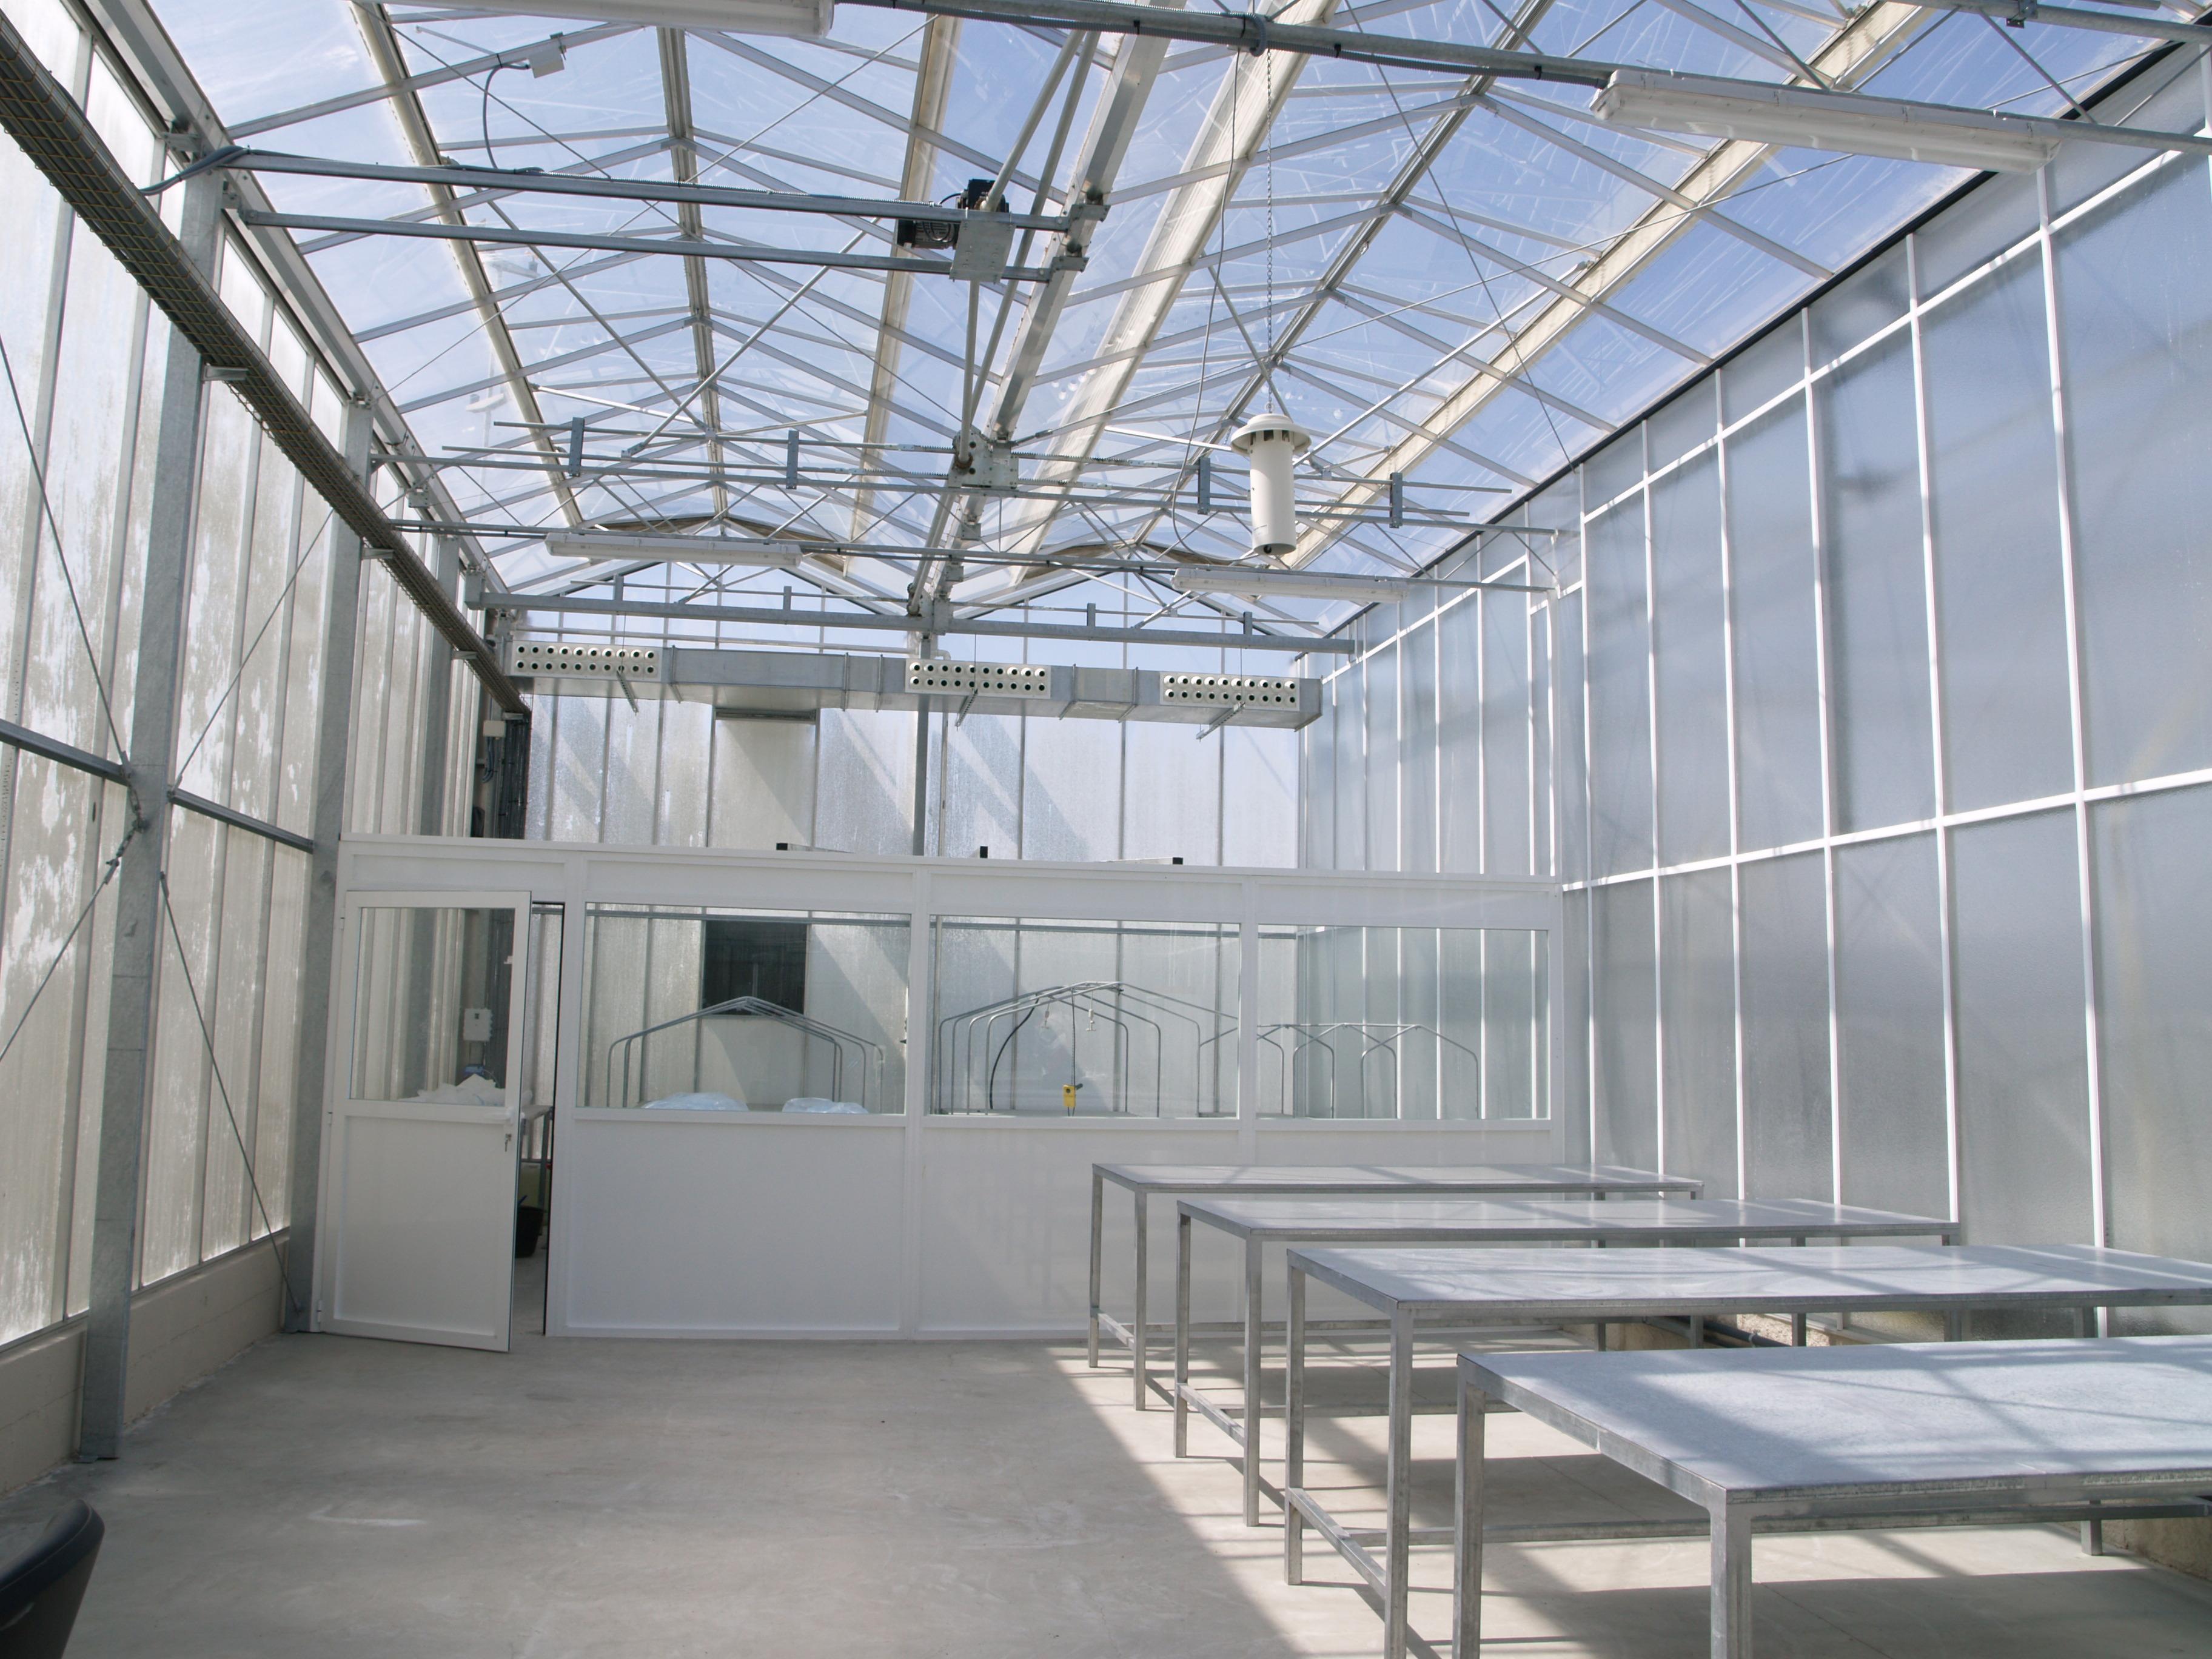 Invernadero de cristal fotos de curiosas - Invernadero de cristal ...